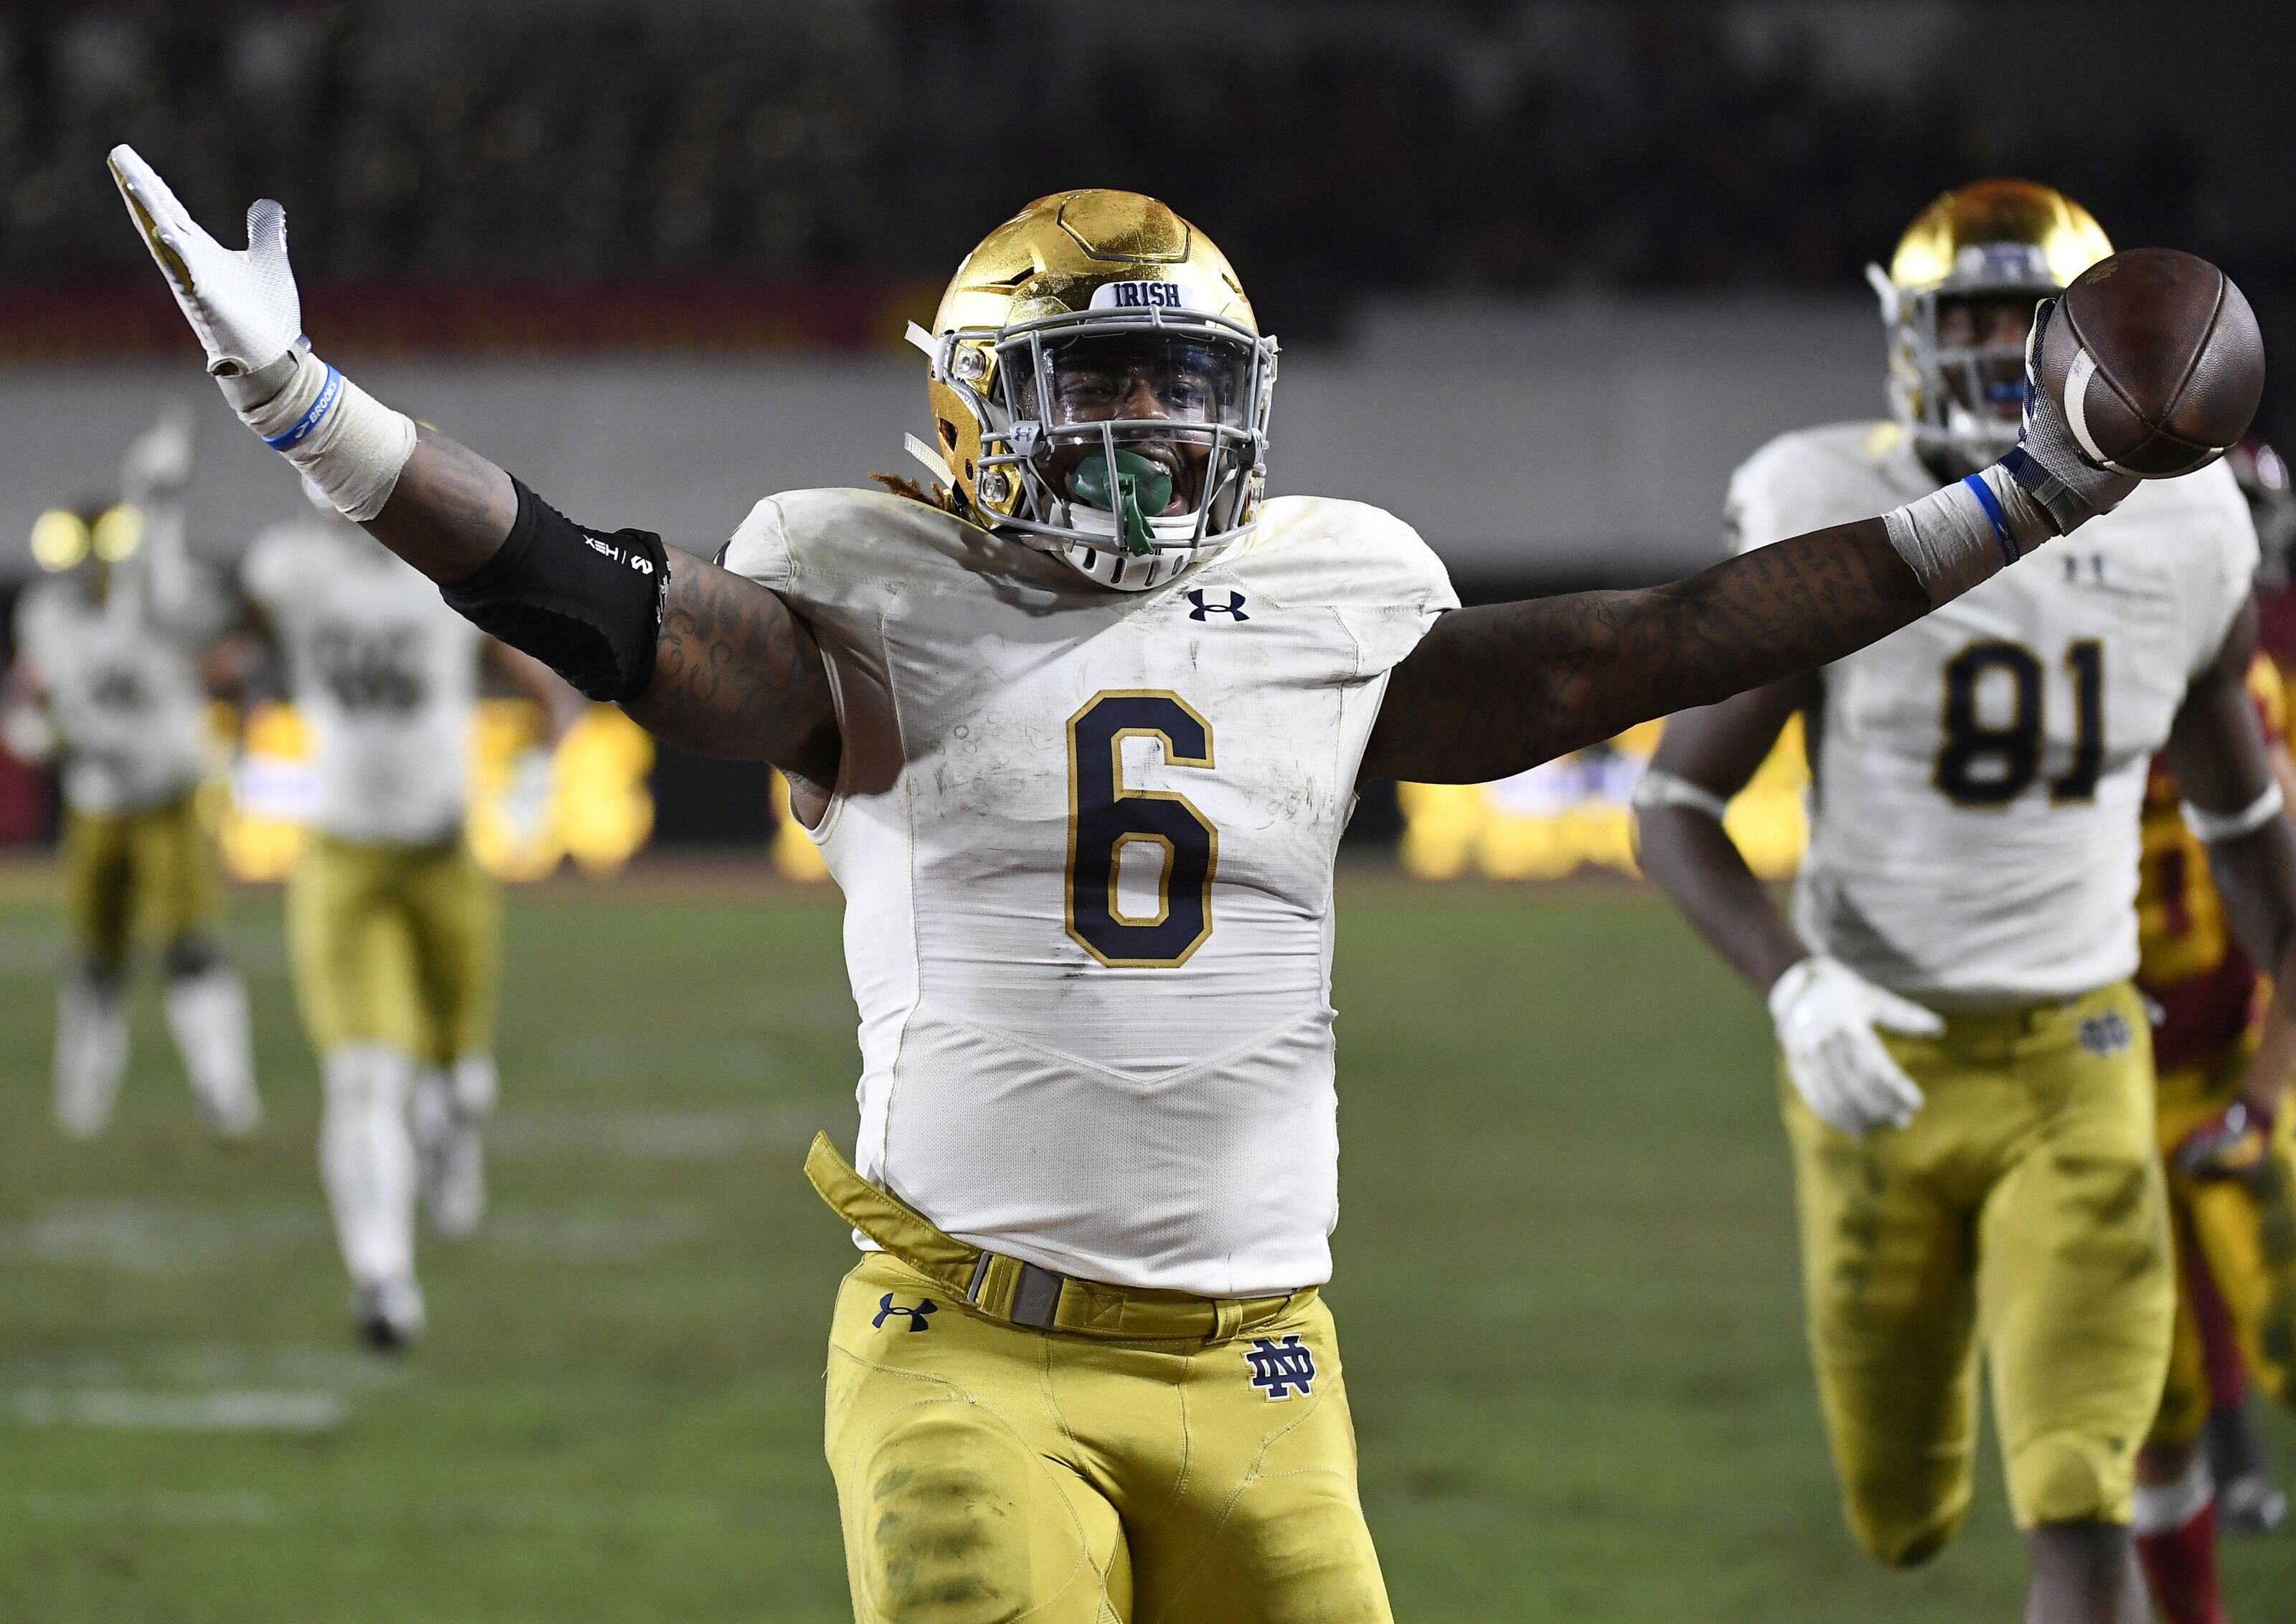 6964cb87ef9 Notre Dame Football: Can Tony Jones Jr. take control of backfield?